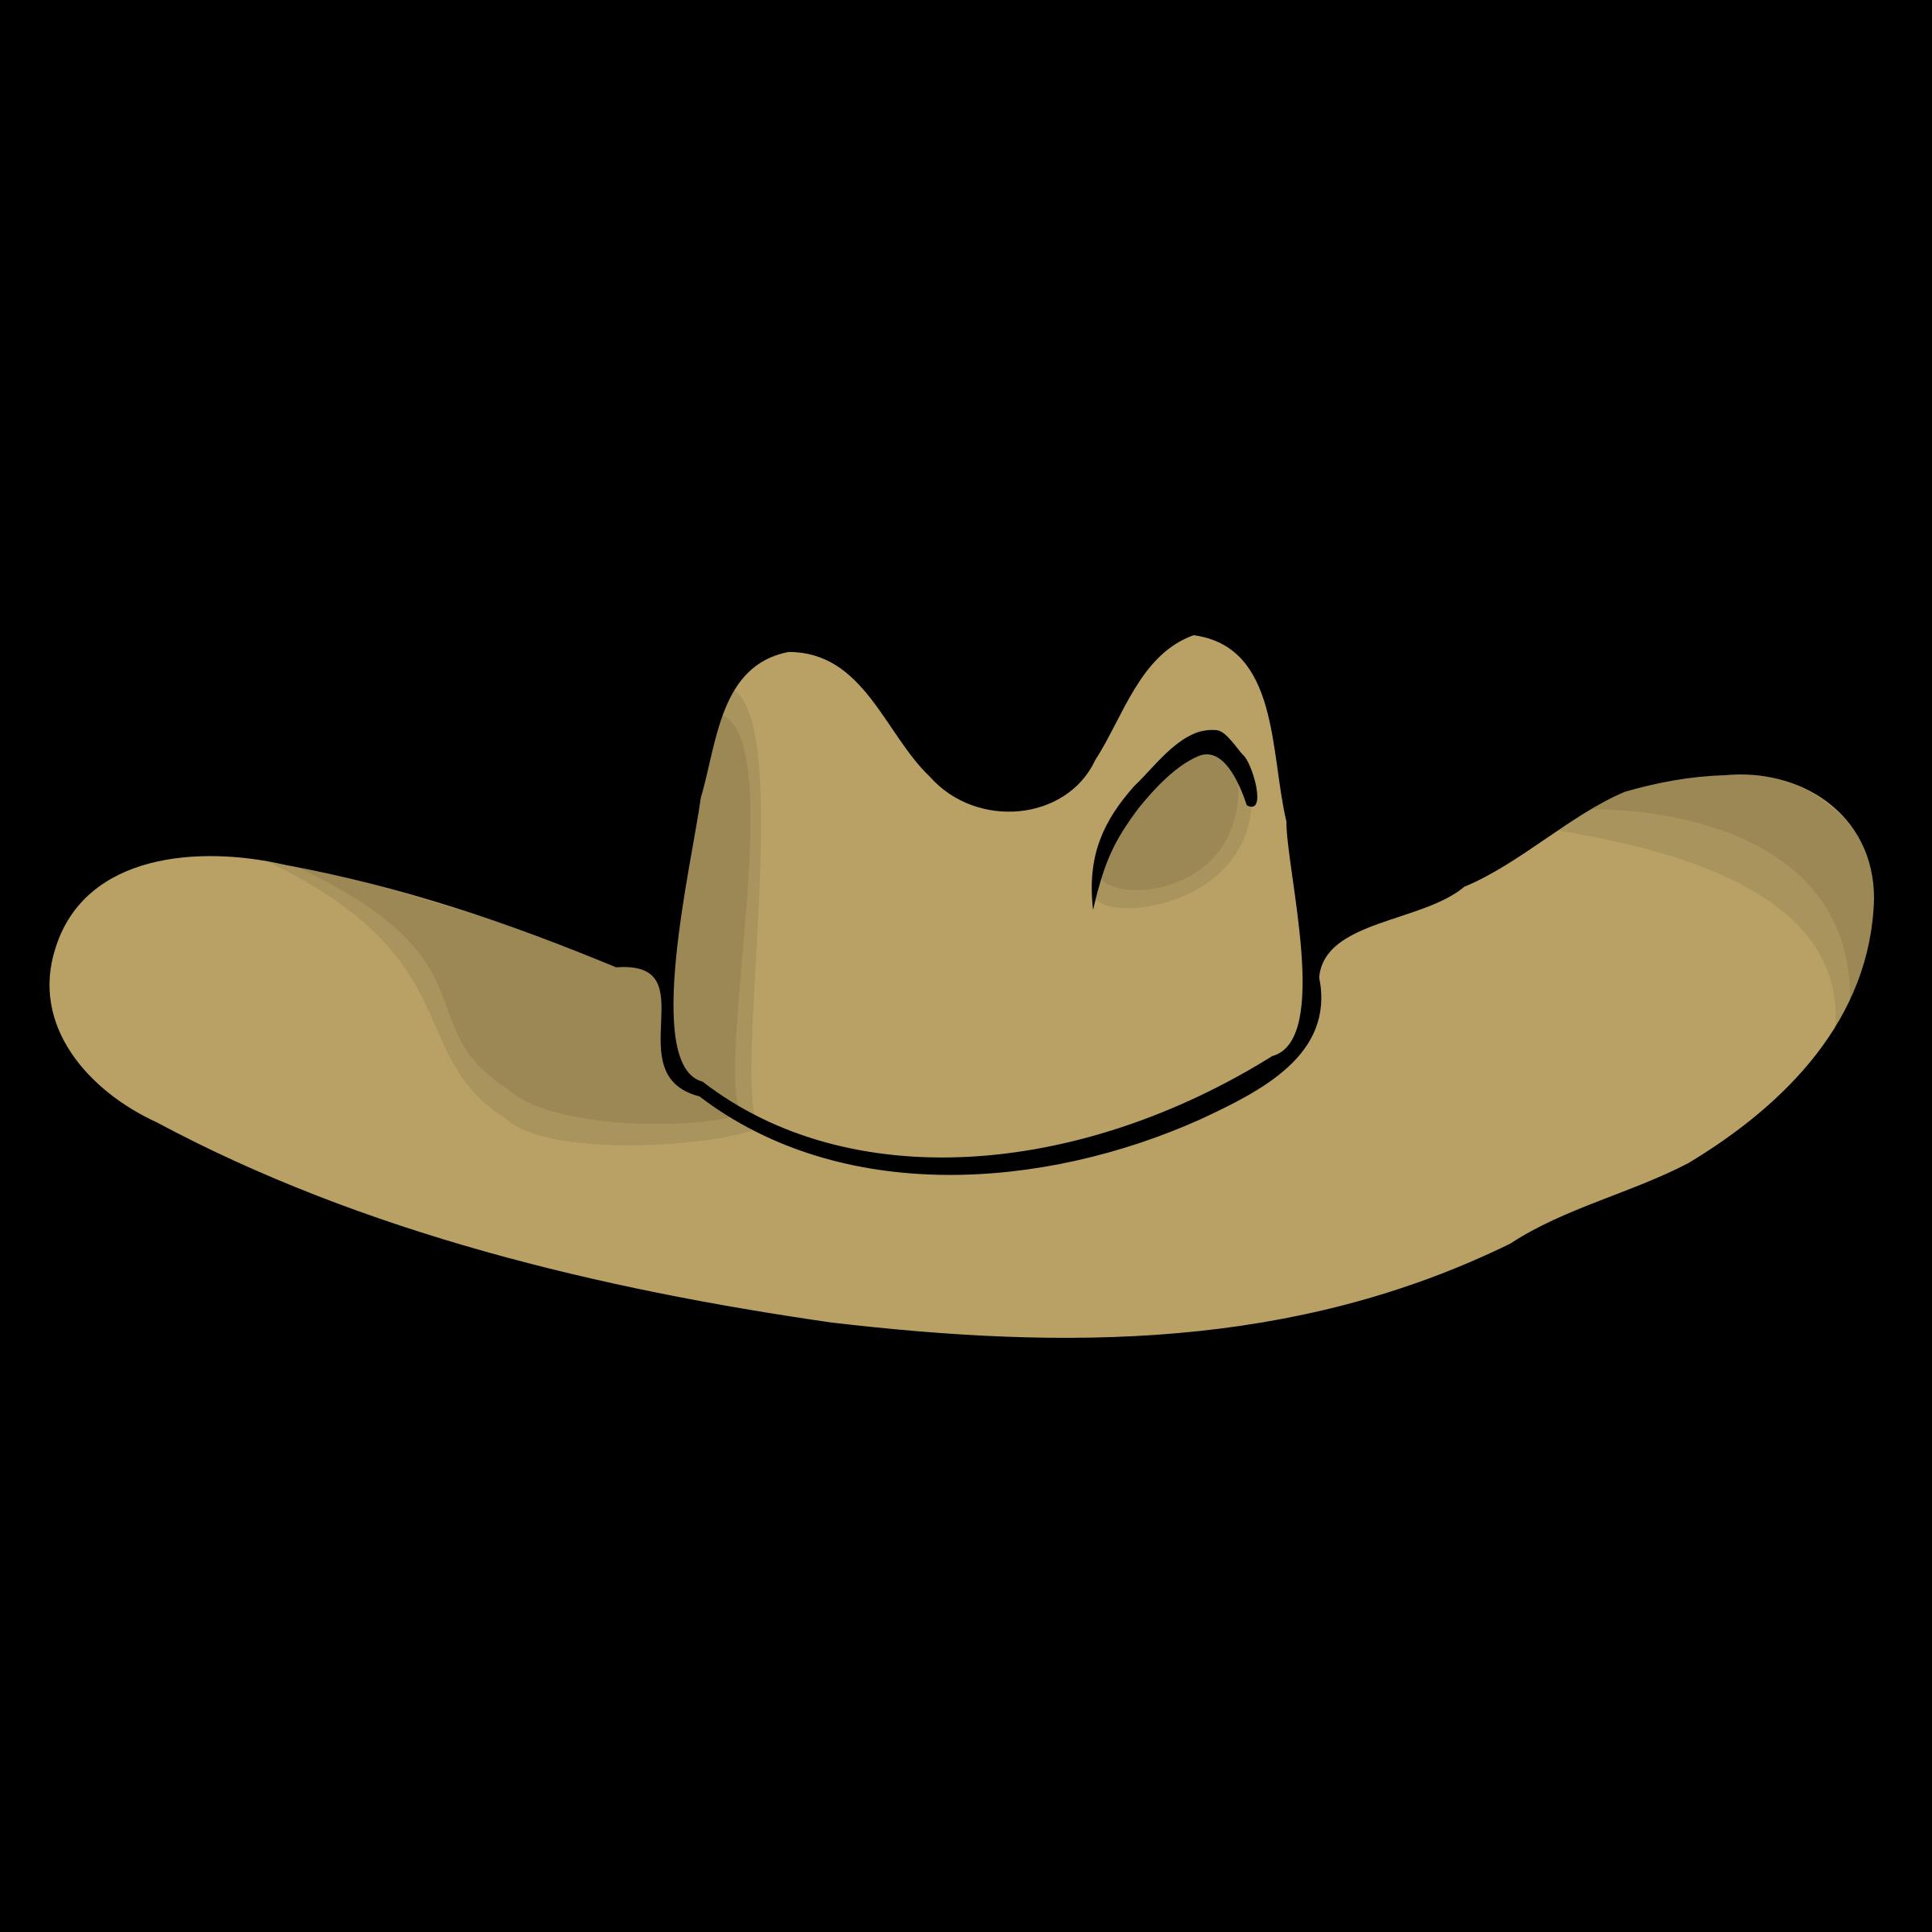 Cowboy clipart round cap. Hat cartoon